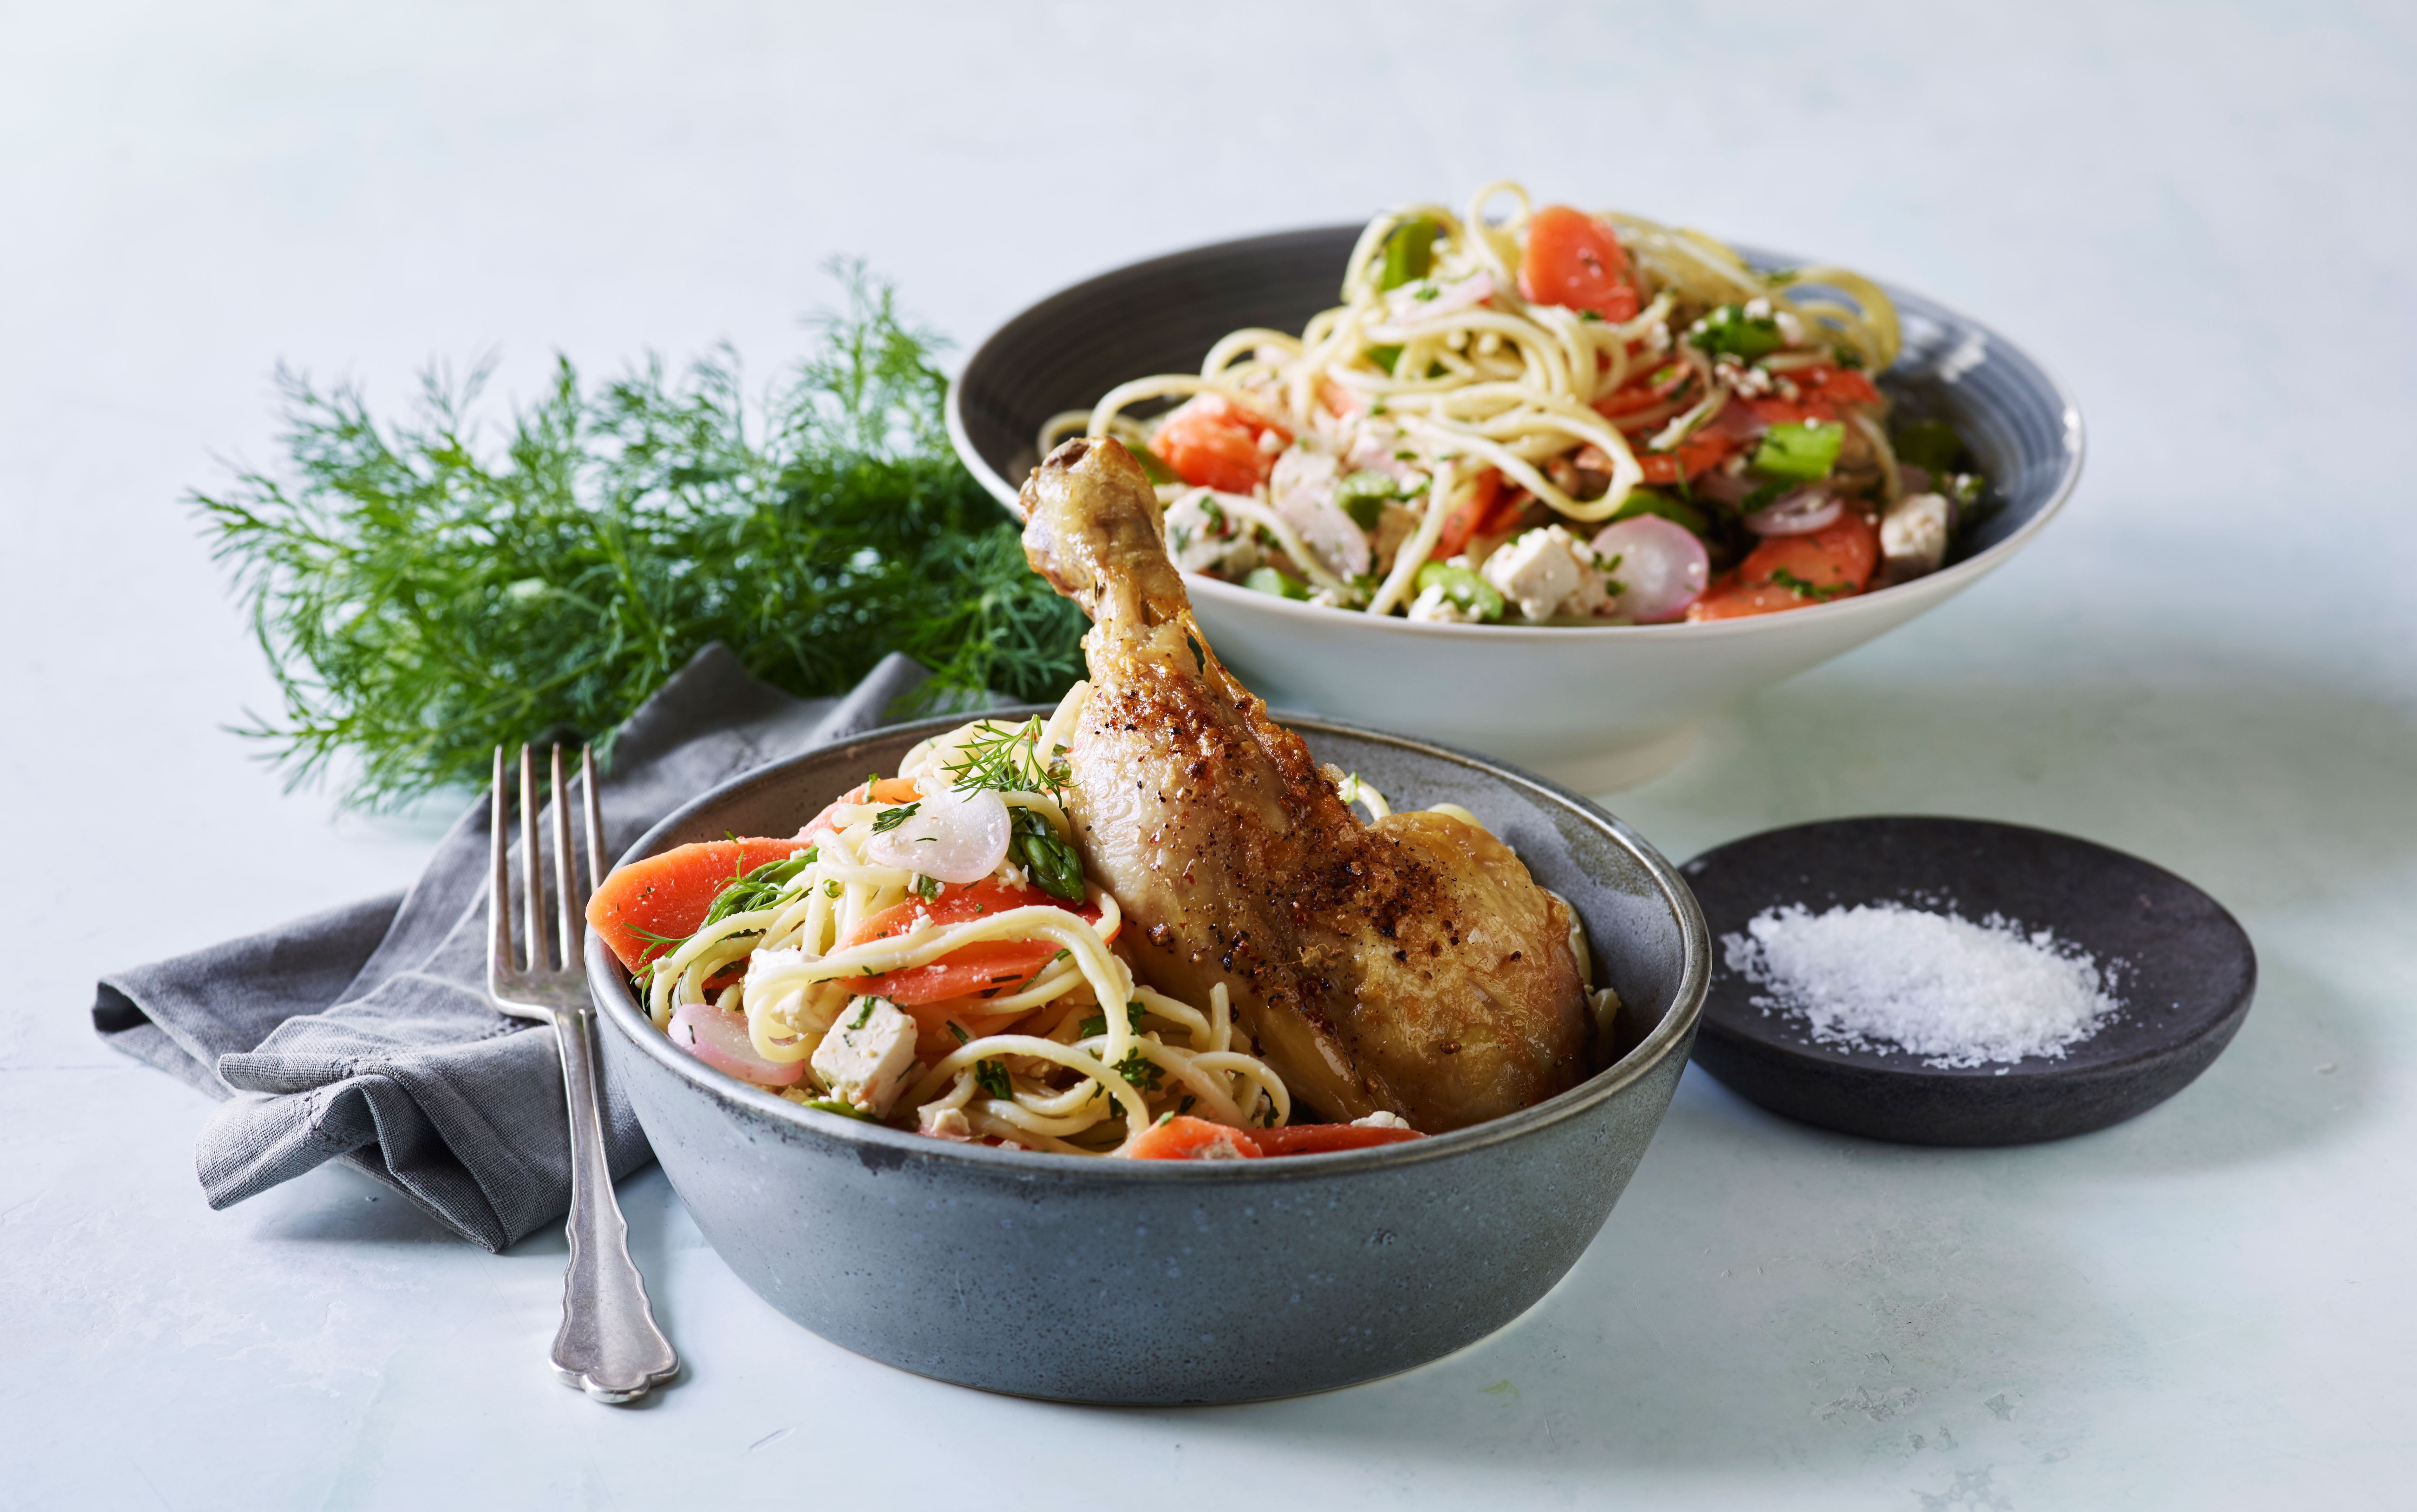 Stegt kylling med grøntsagsspaghetti